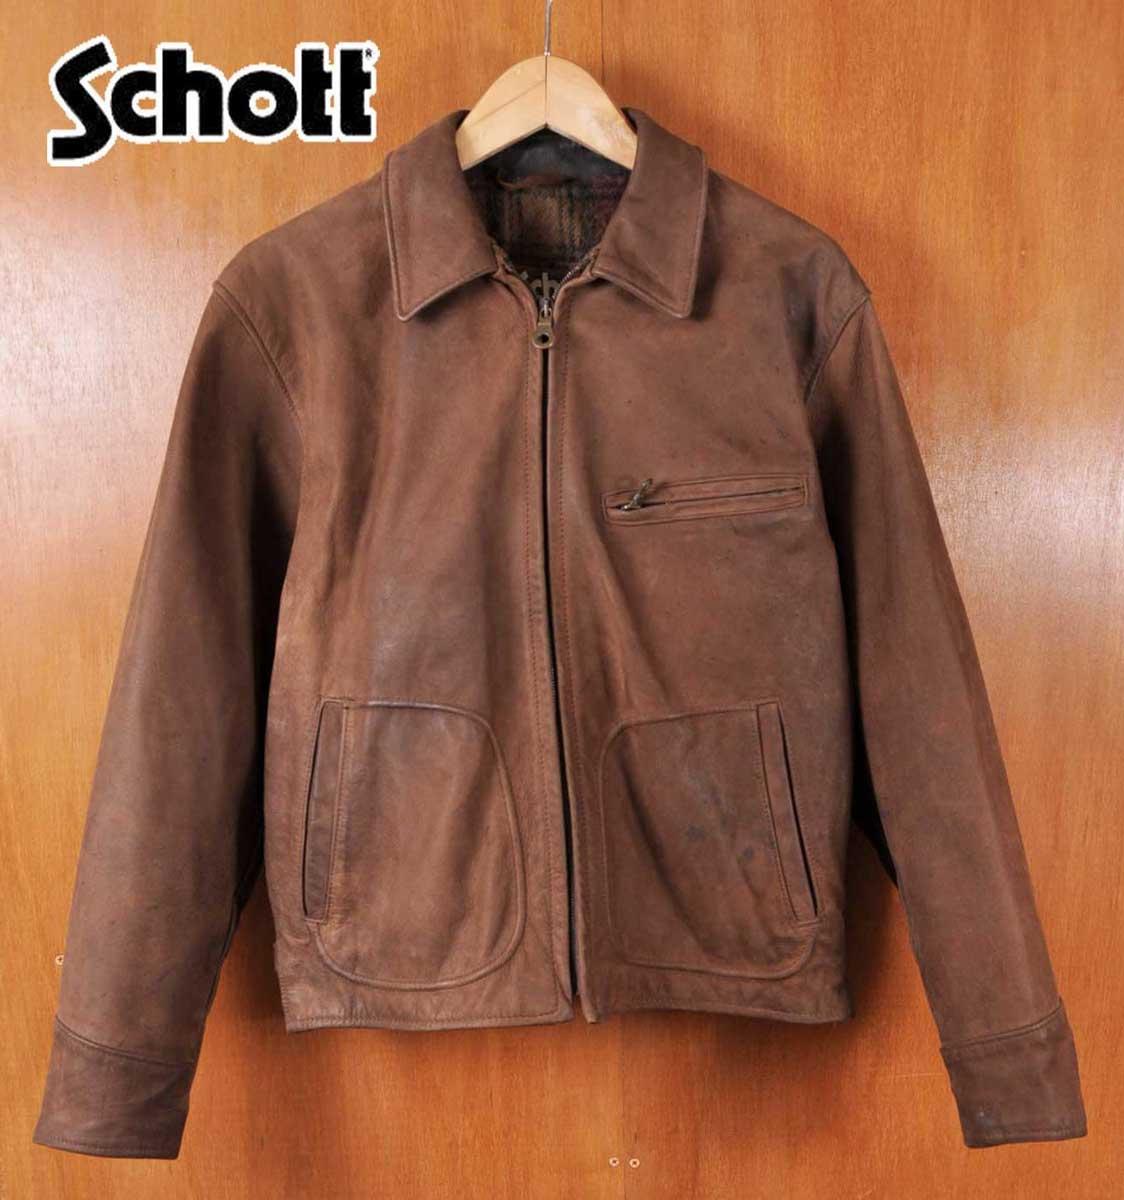 9ff0e648e5da1 Made in USA   SCHOTT shot   Tracker jacket nubuck leather jacket and wool  check liner ...